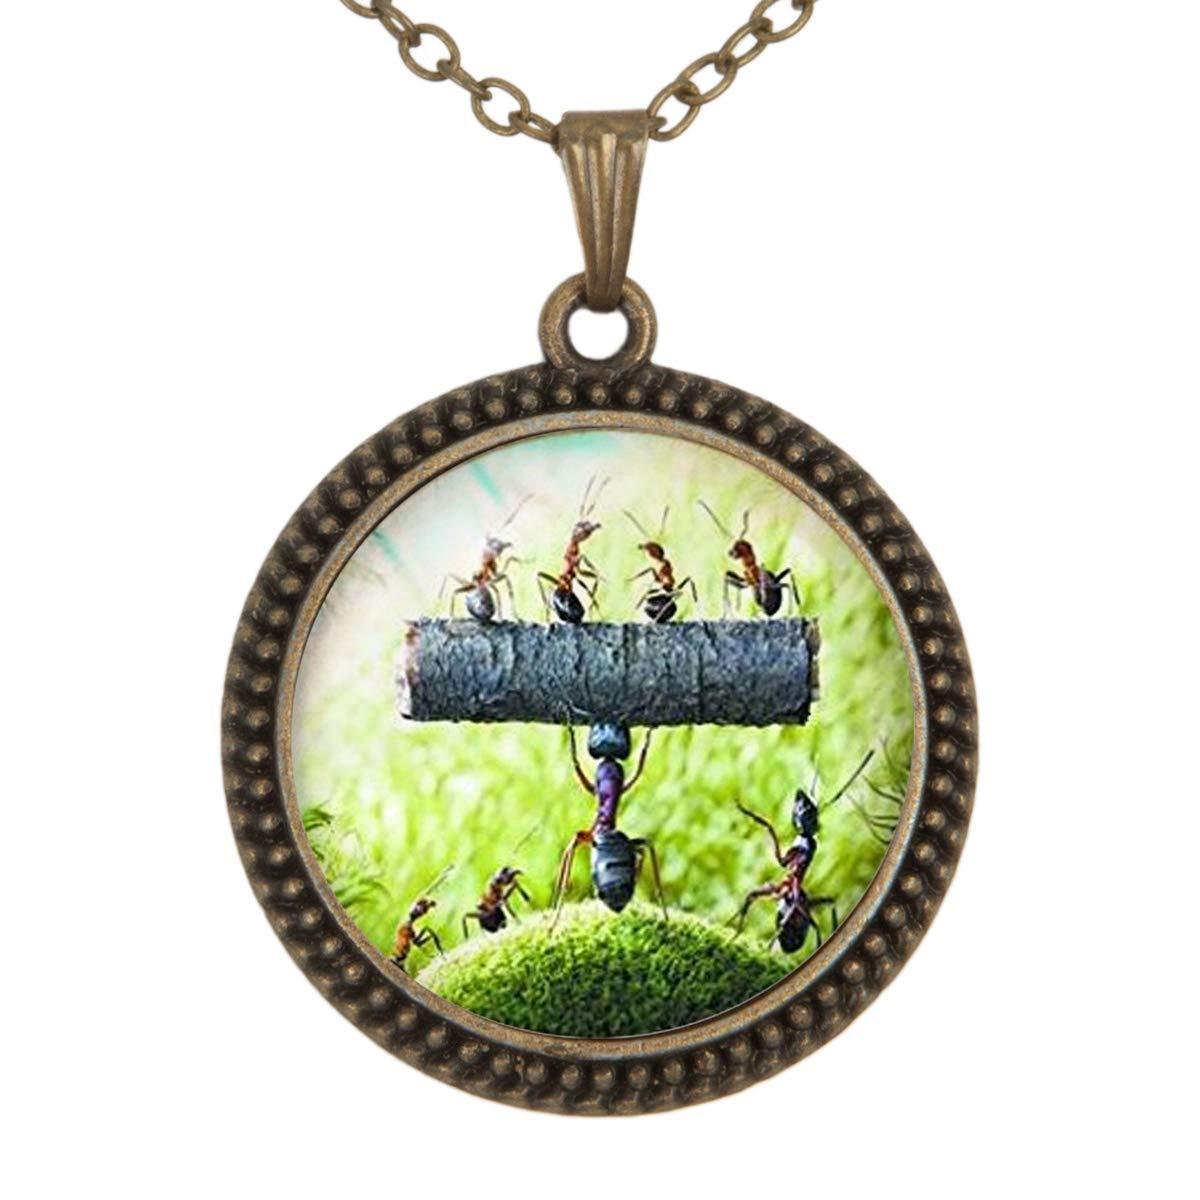 Family Decor Tenacious Ants Pendant Necklace Cabochon Glass Vintage Bronze Chain Necklace Jewelry Handmade